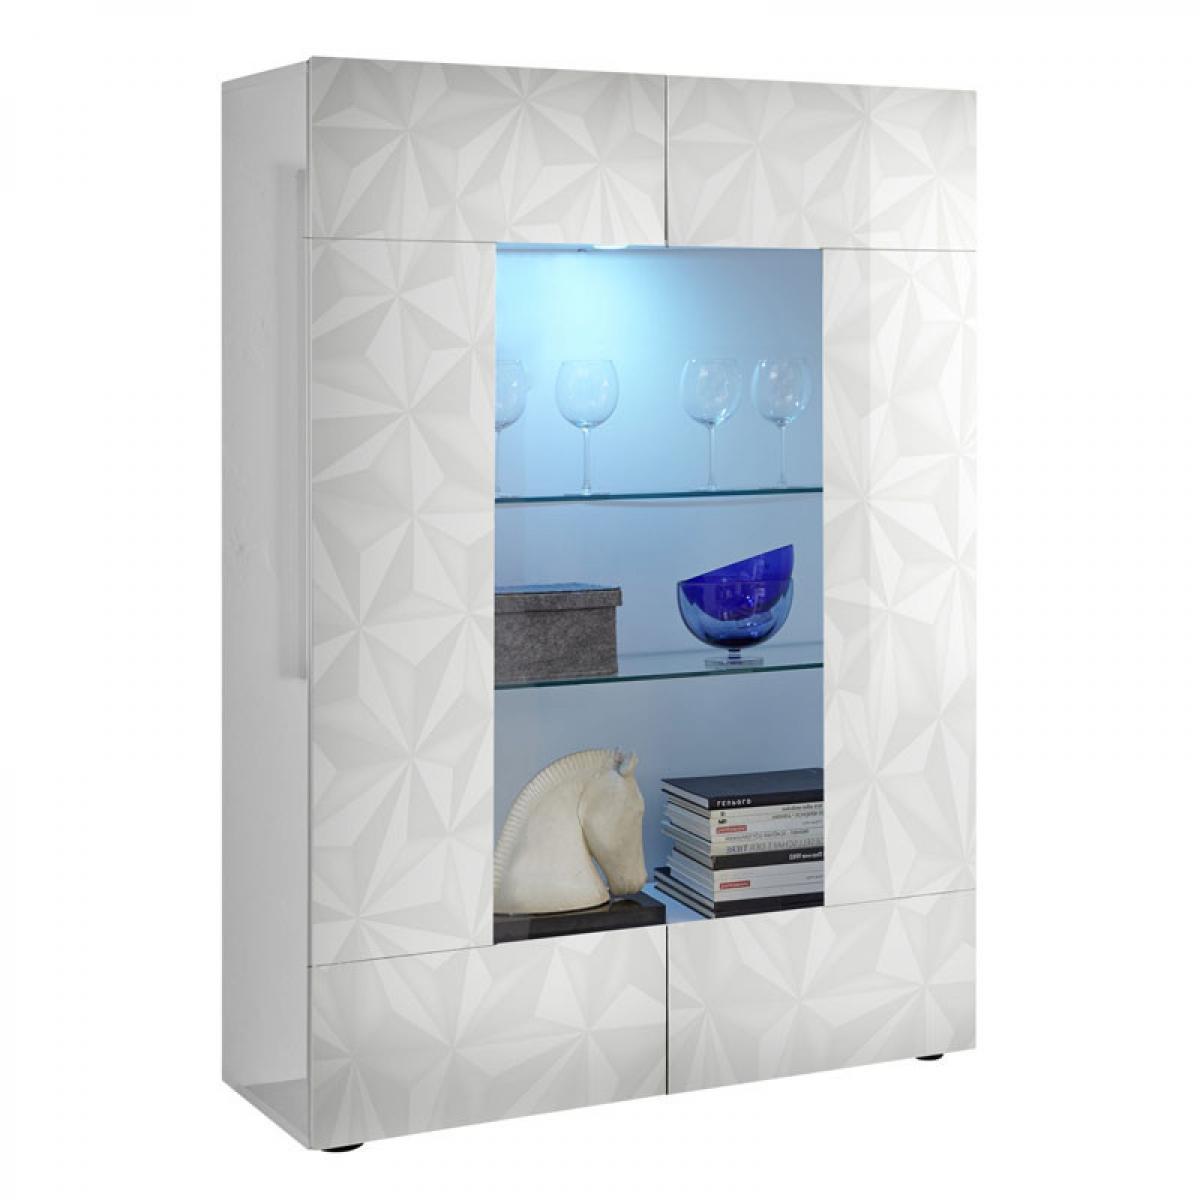 Tousmesmeubles Vitrine 2 portes Laqué Blanc brillant à LEDs - KIOO